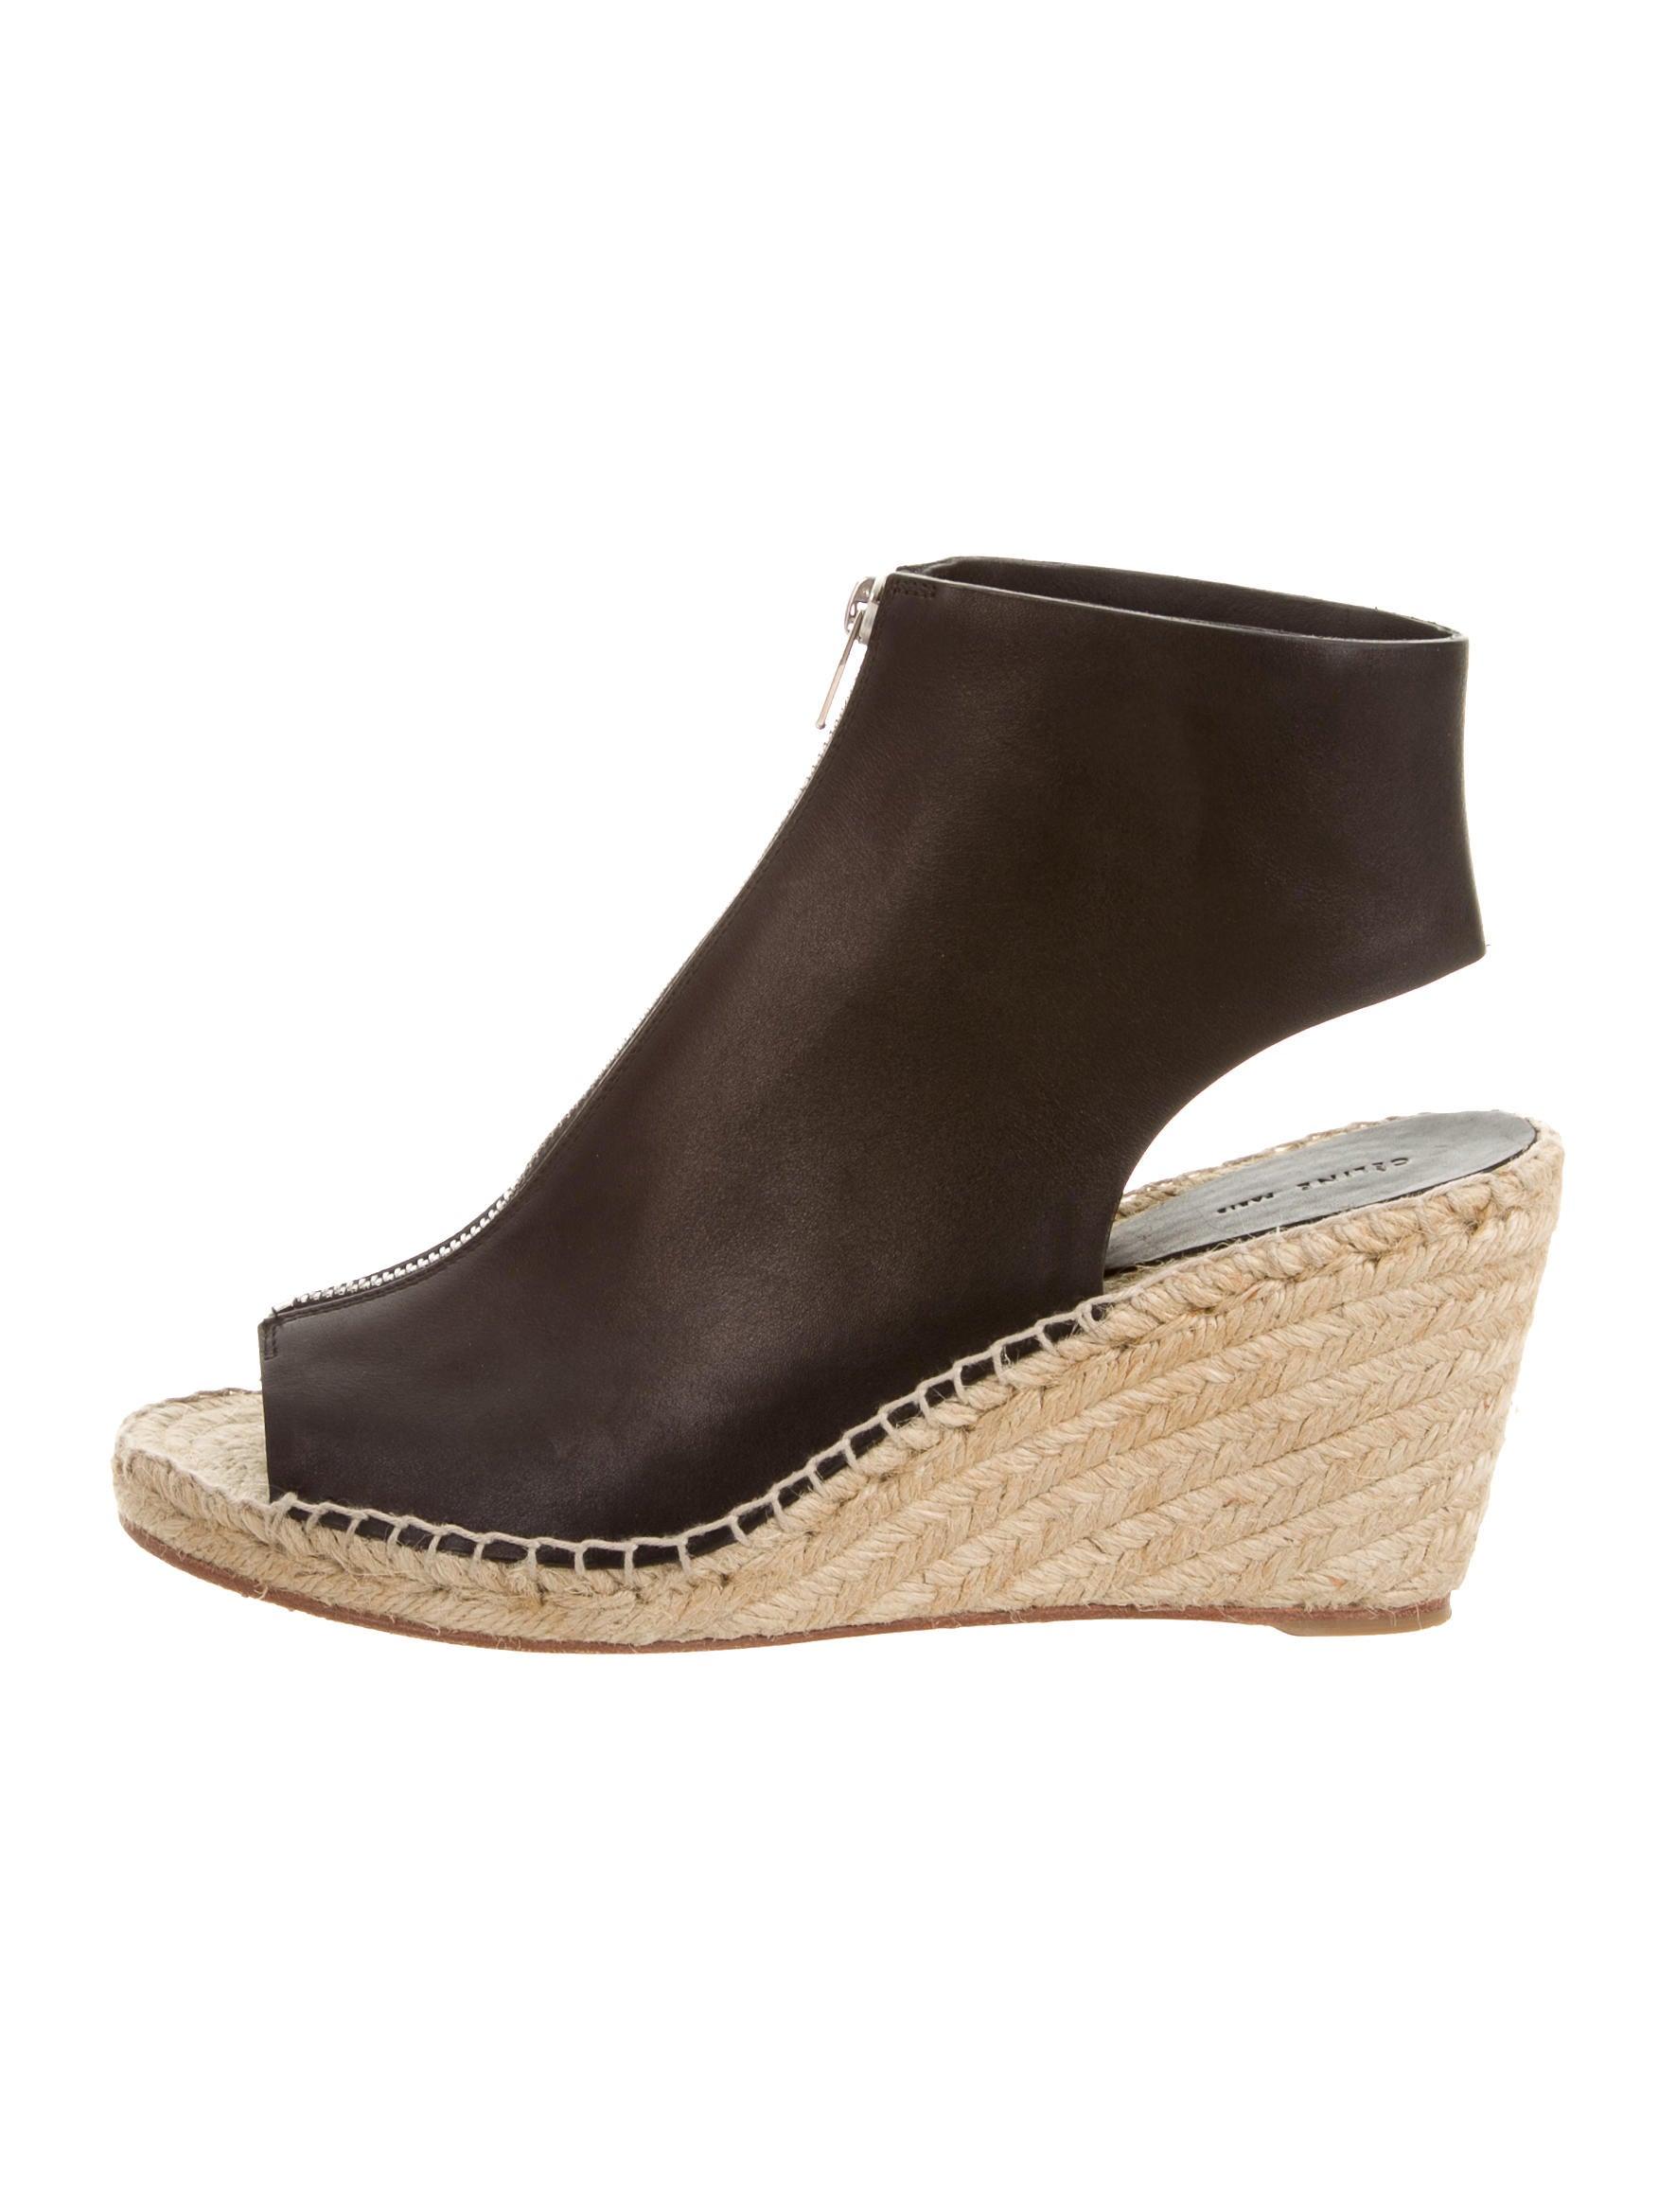 c 233 line espadrille wedge sandals shoes cel45354 the